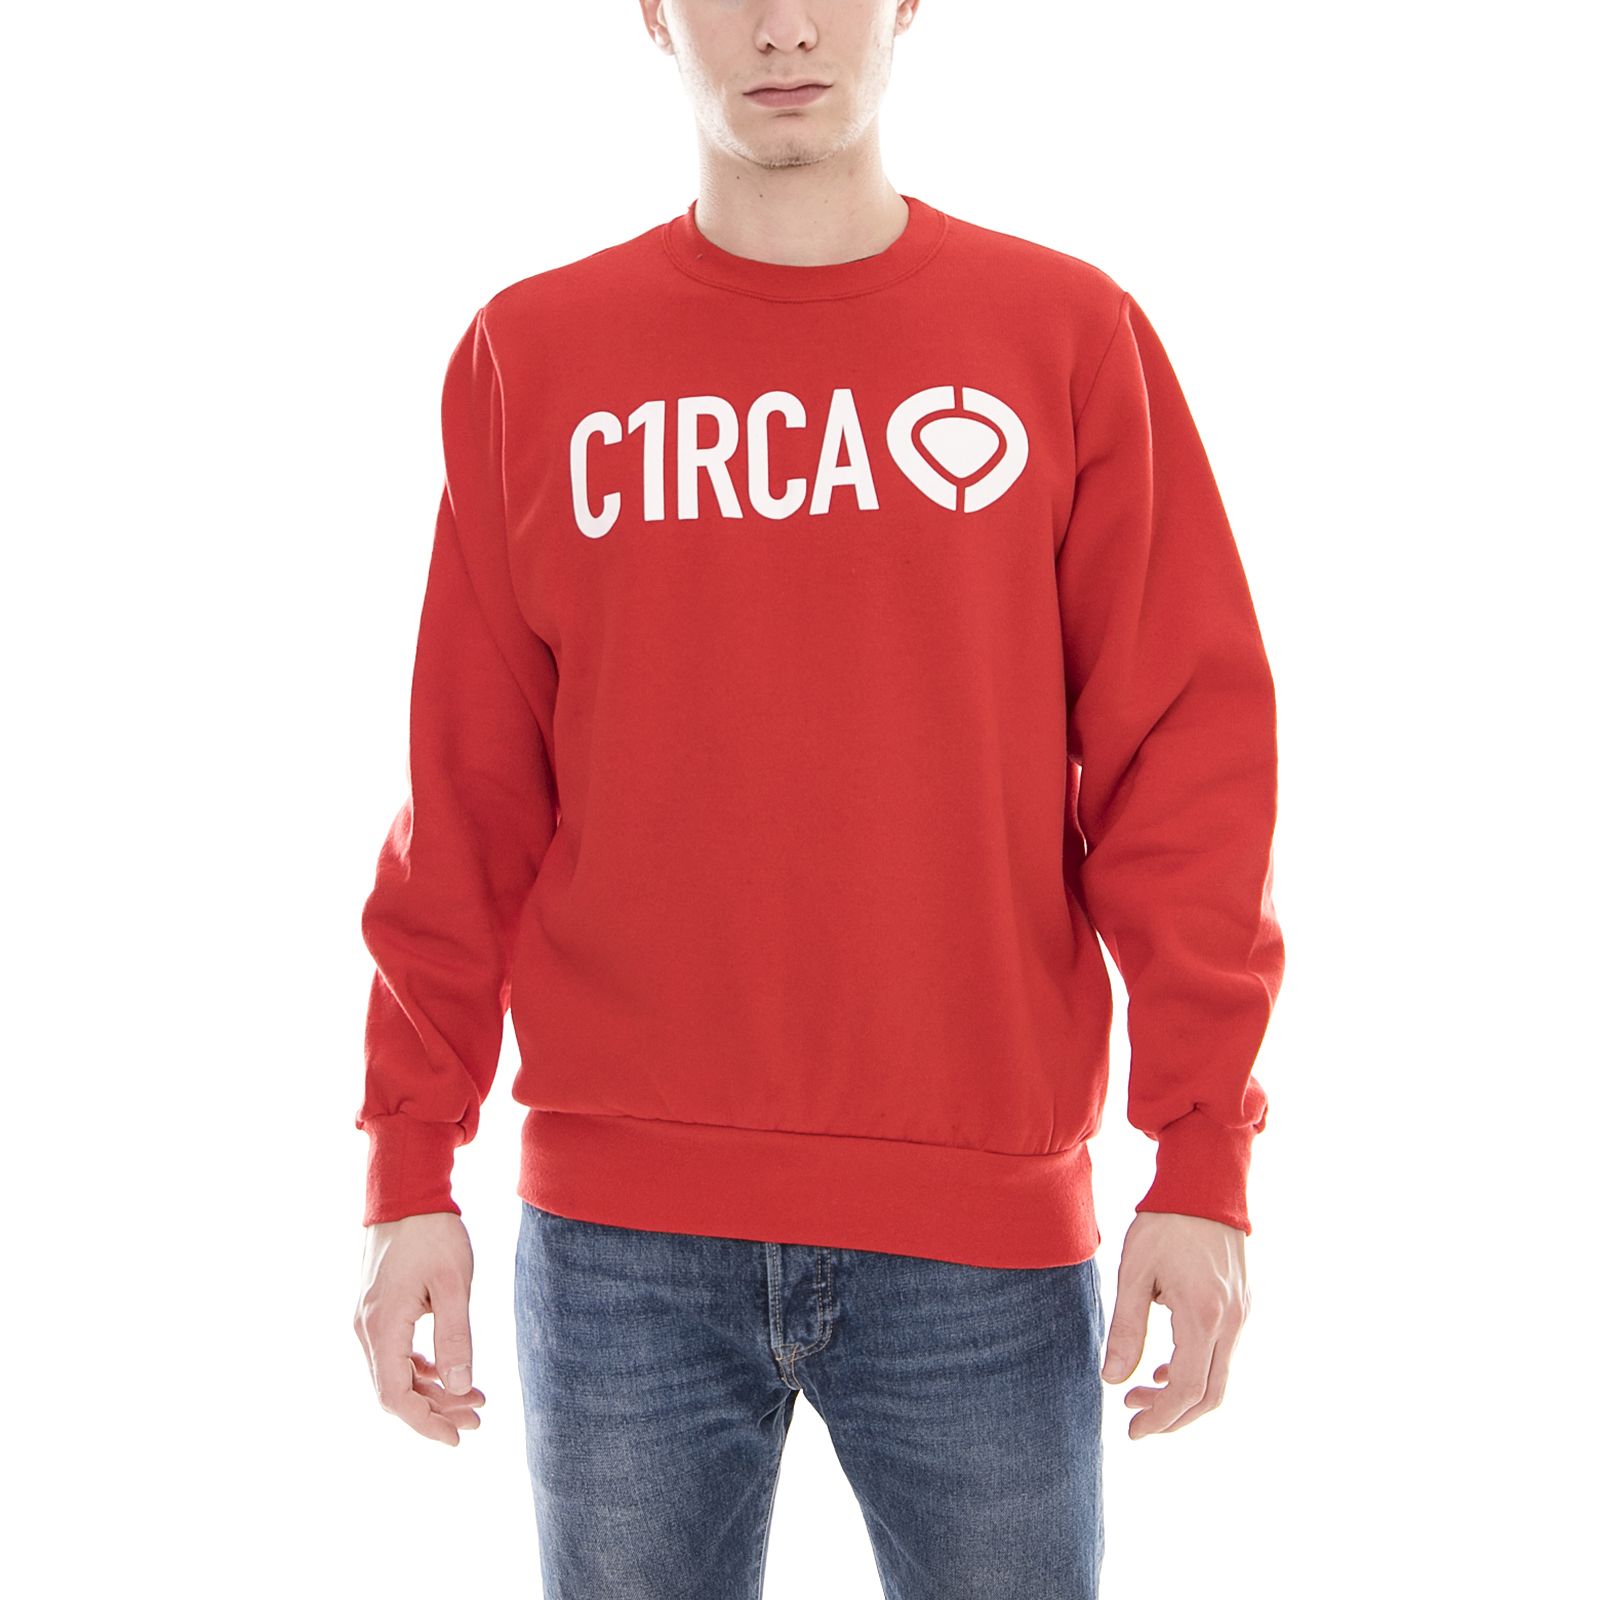 C1rca Sweatshirt Din Symbol Crew Rot